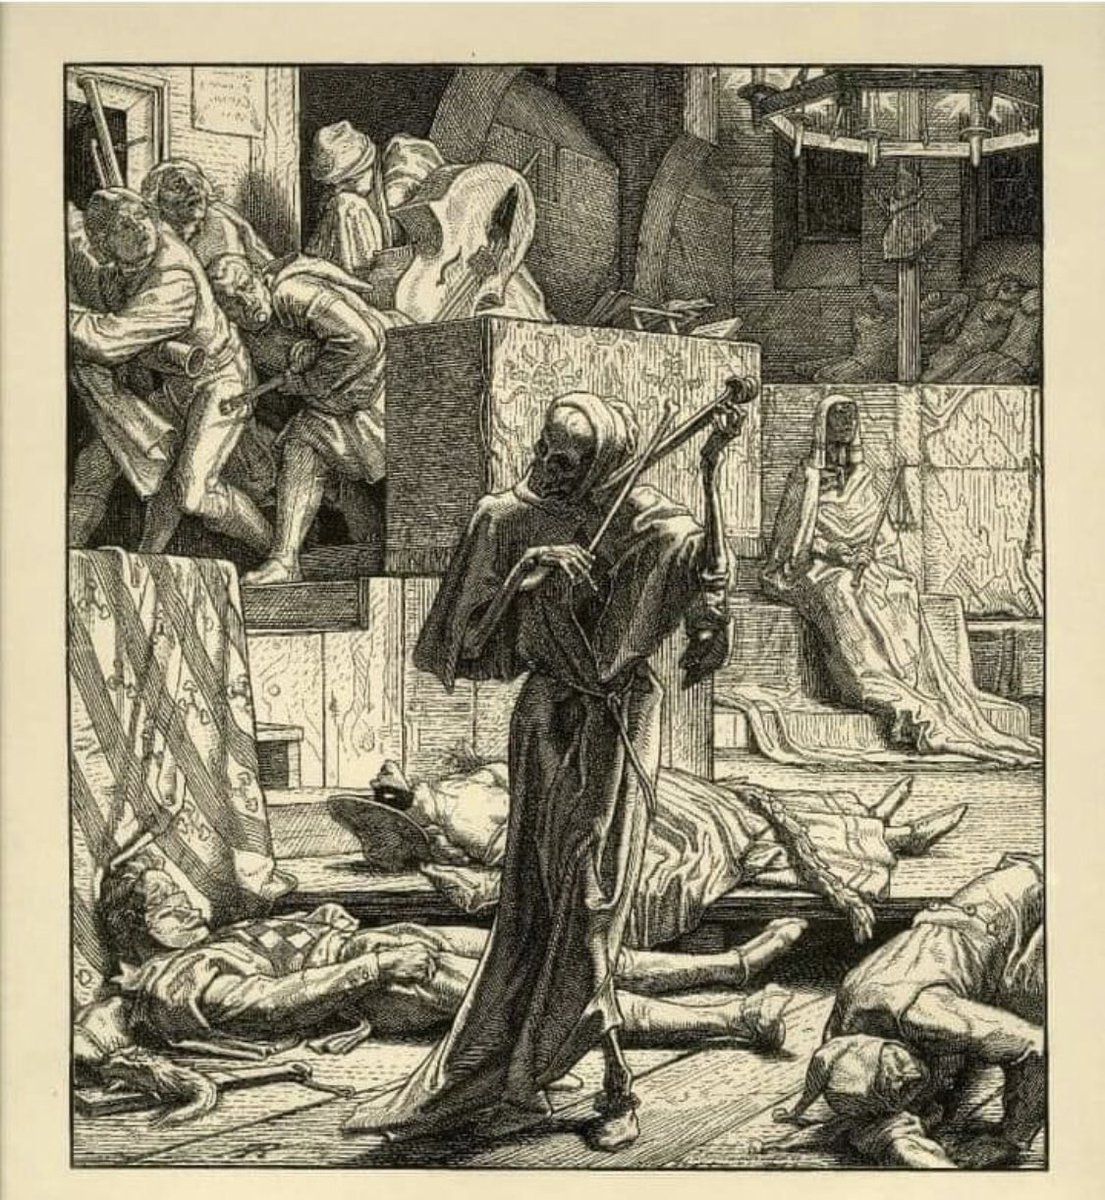 Jf Twitter પર La Muerte Toca Do Violin Epidemia De Cólera En Paris Artista Alfred Rethhel